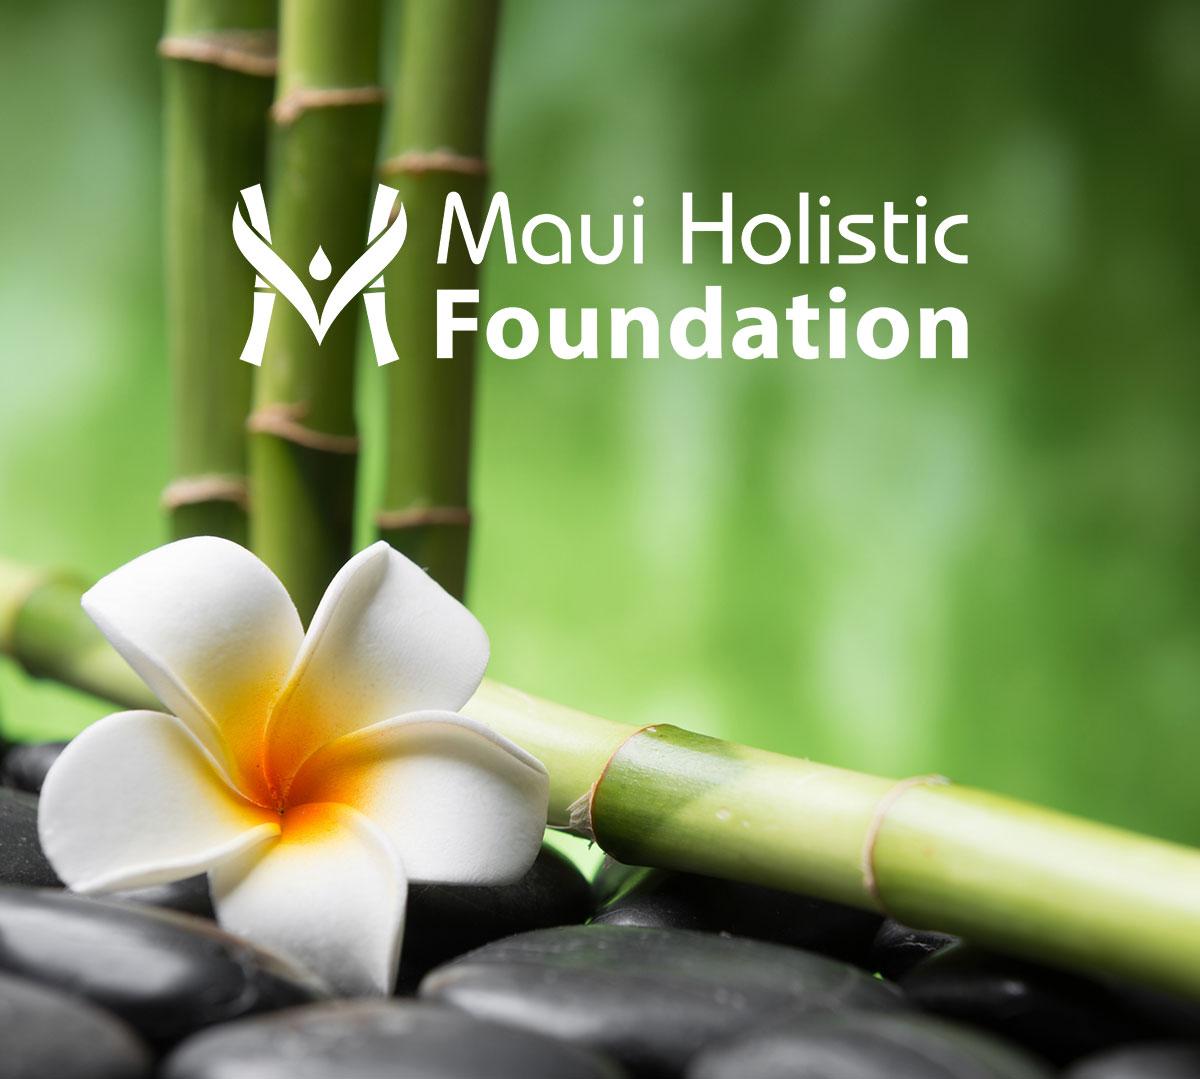 Maui Holistic Foundation logo